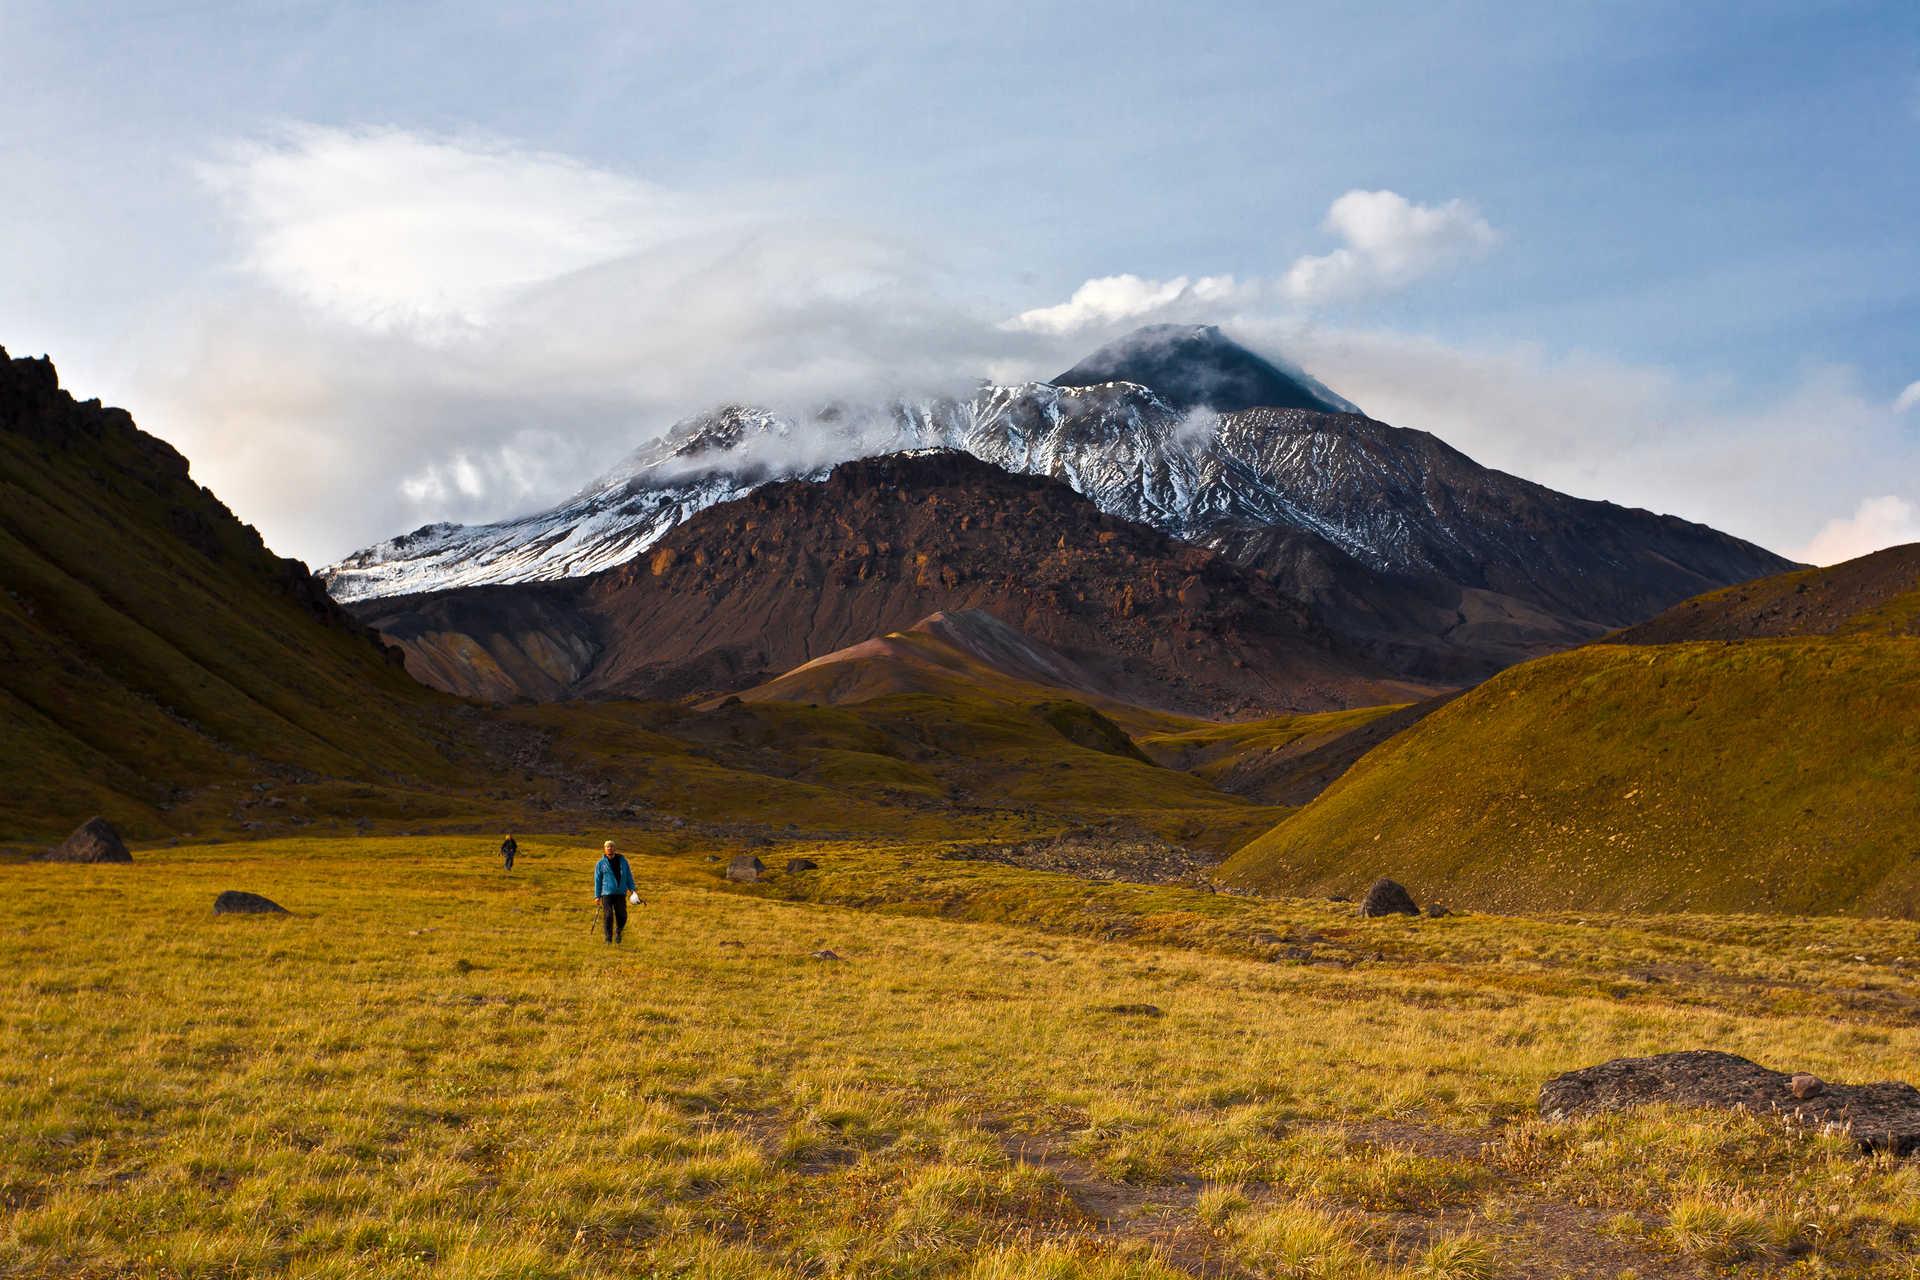 L'été au Kamtchatka